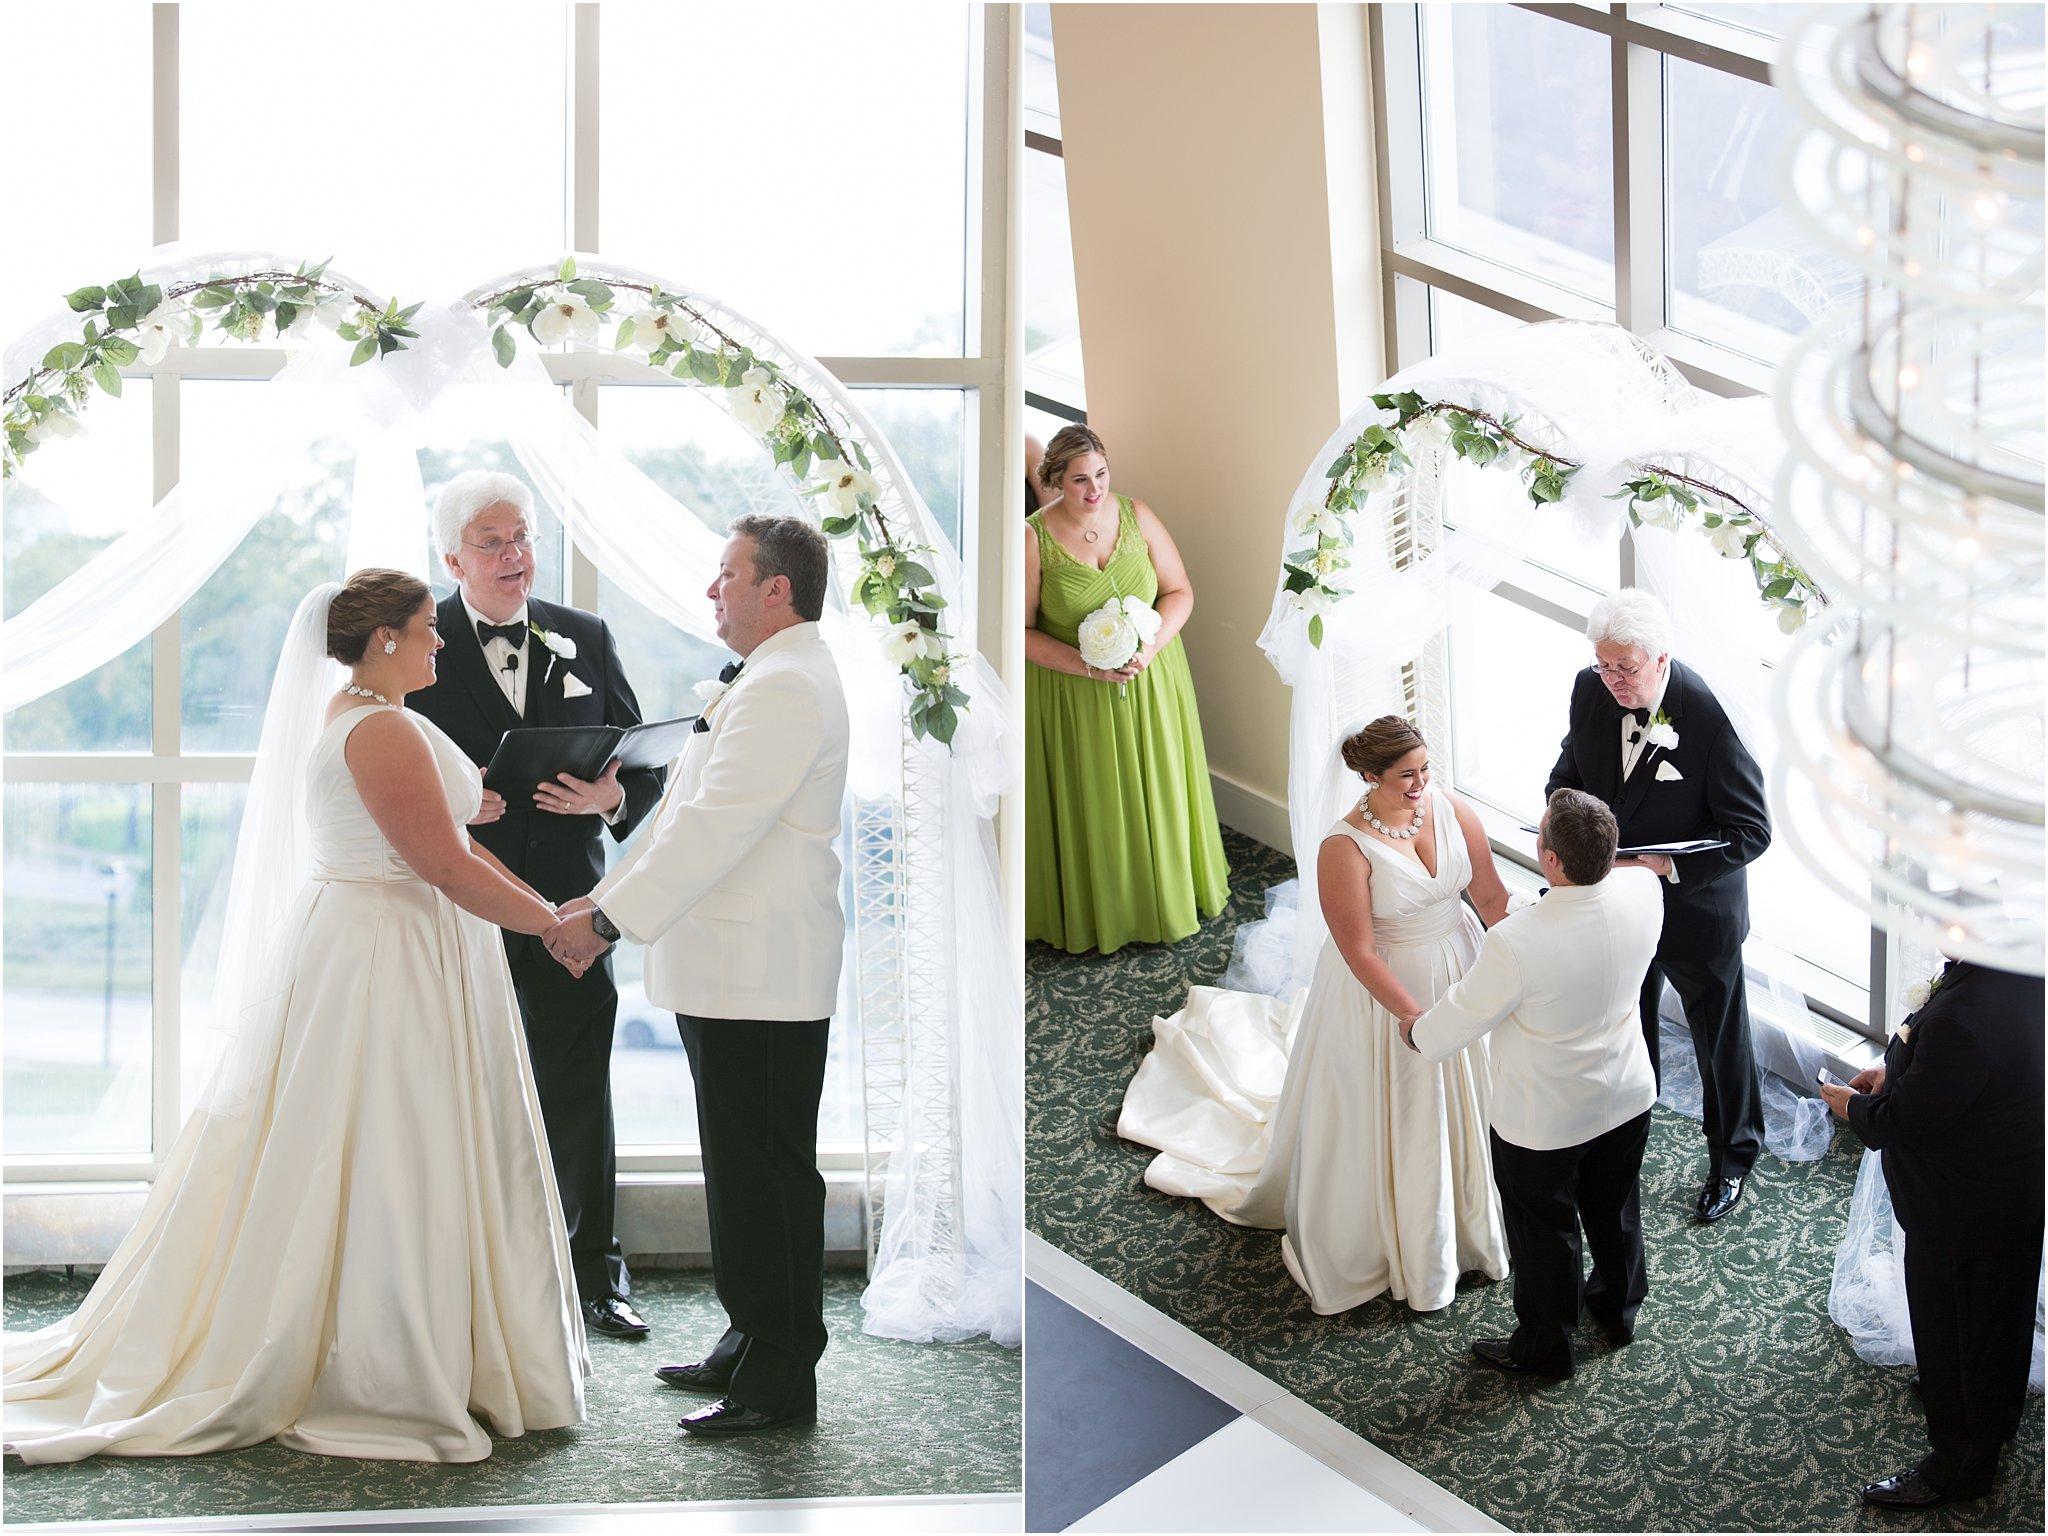 va_jessica_ryan_photography_virginia_wedding_norfolk_harrison_opera_house_norfolk_arts_district_portraits_3786